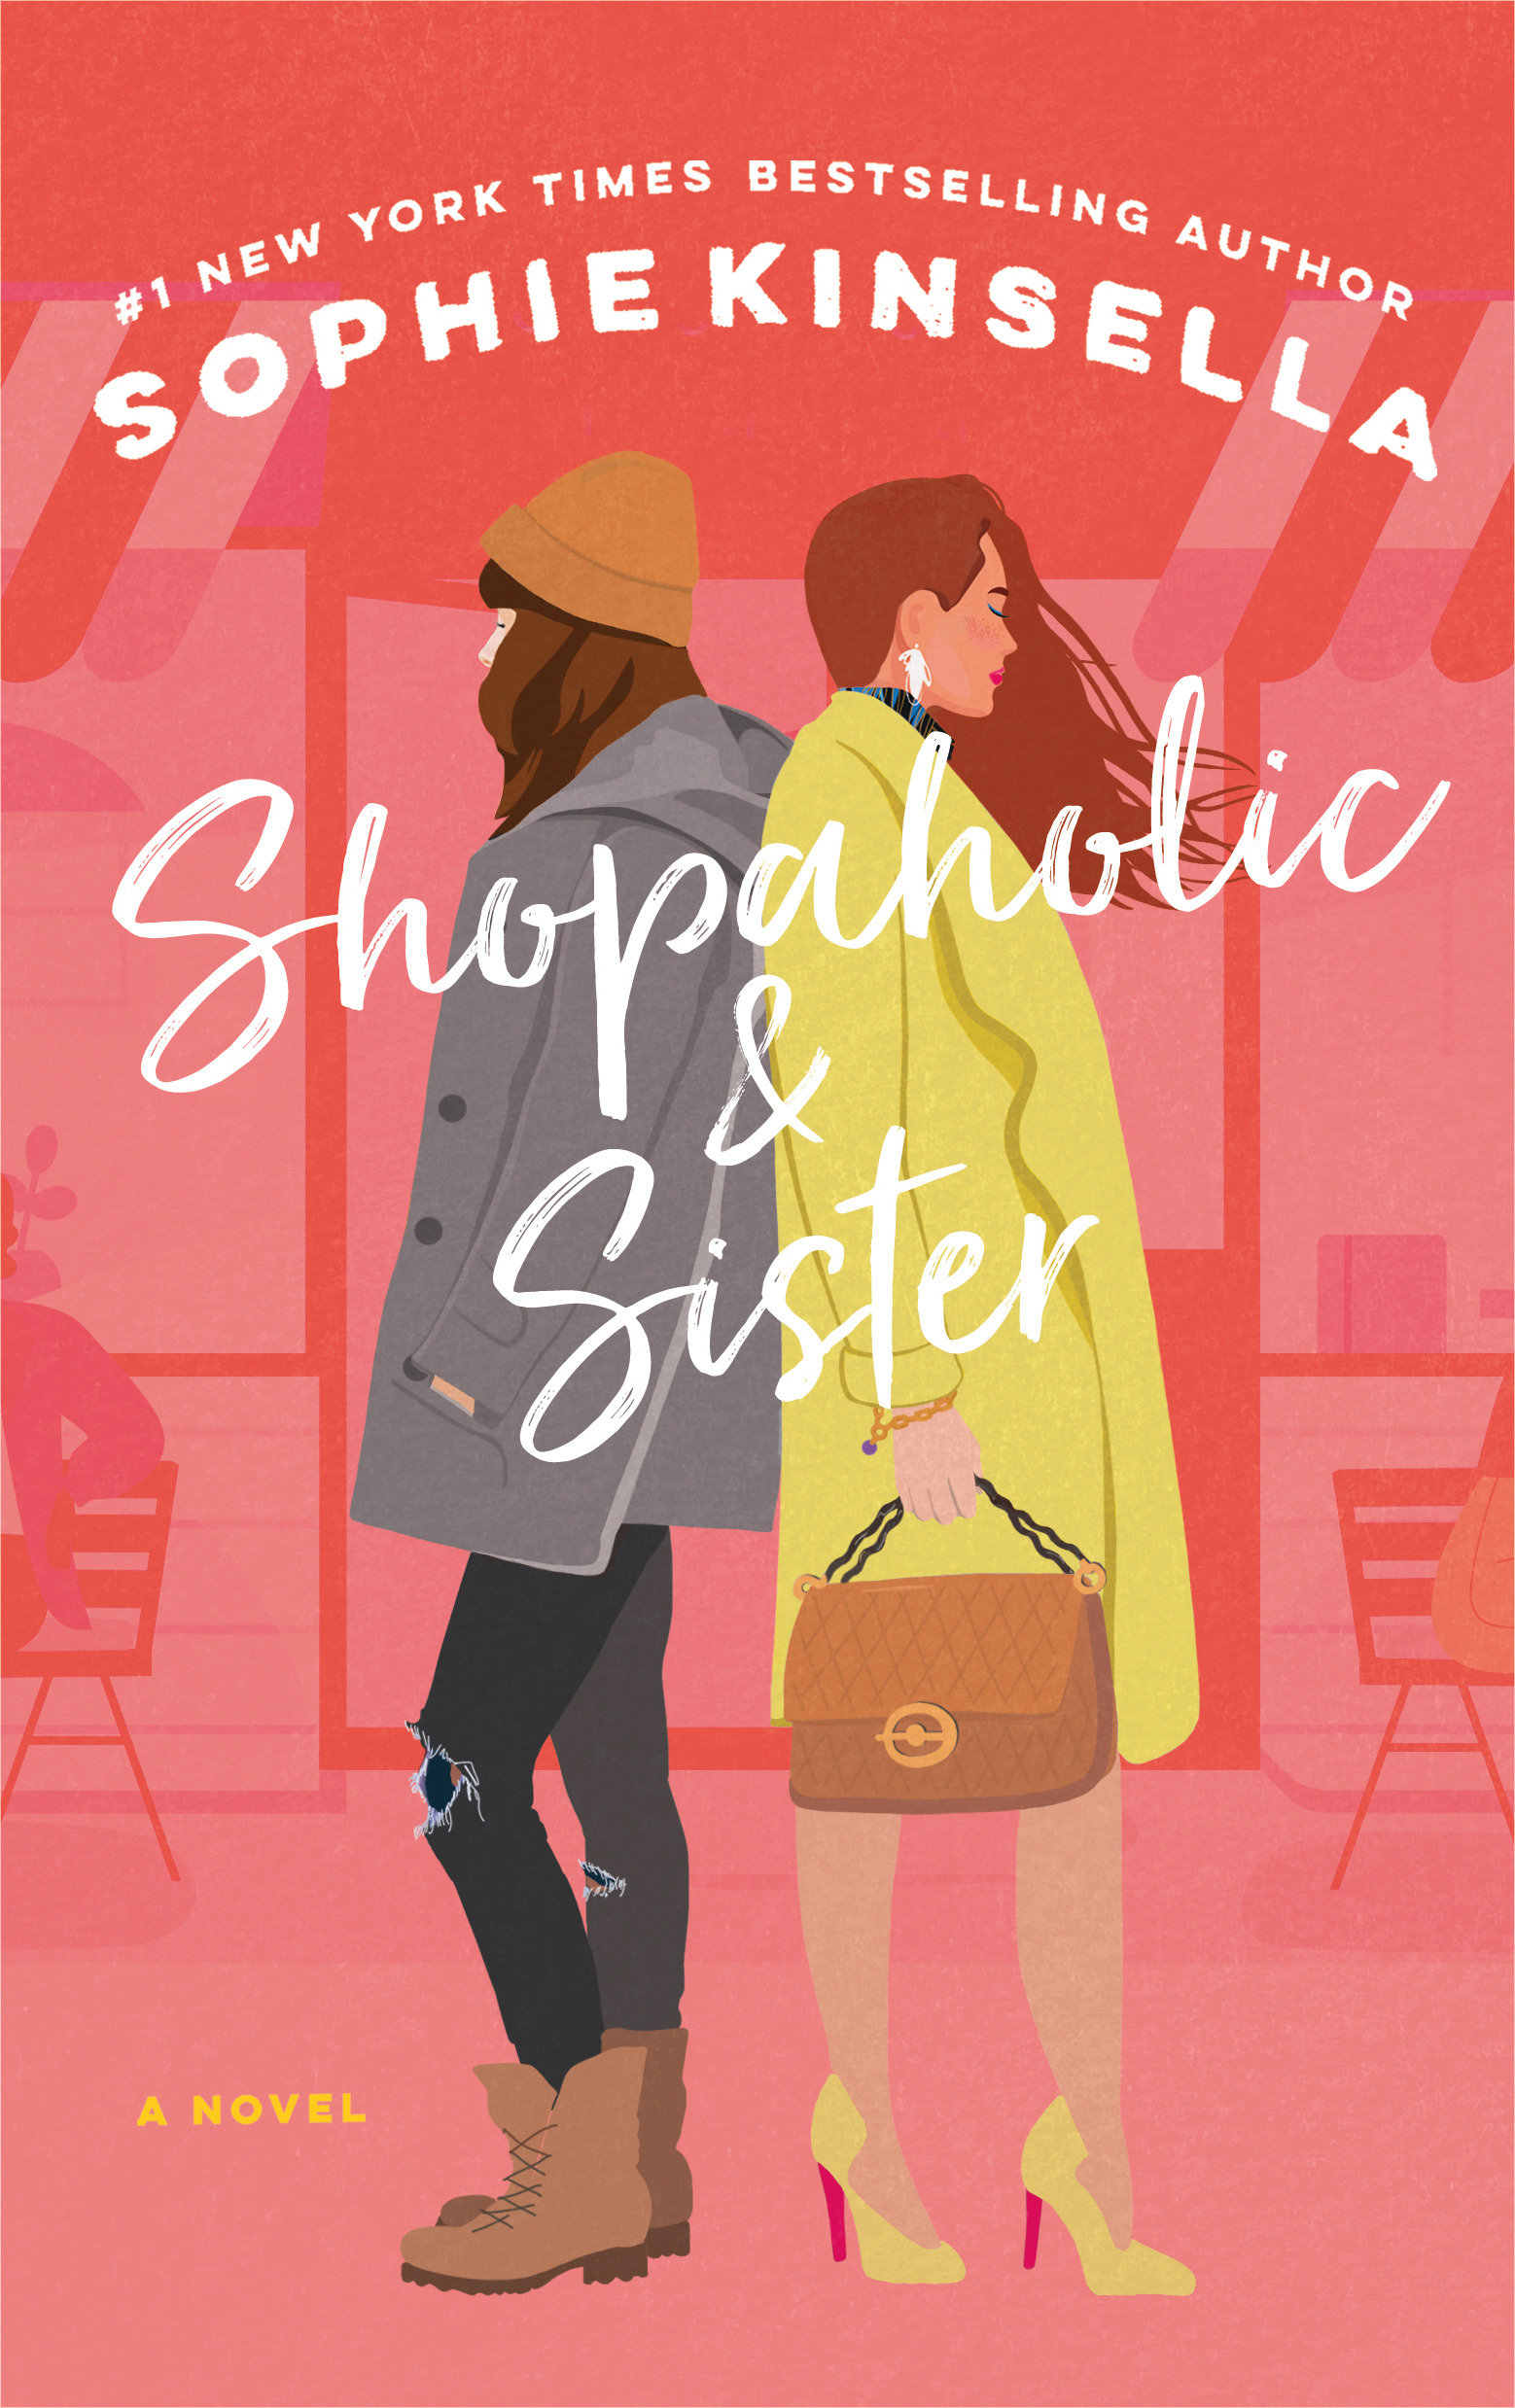 Shopaholic & sister cover image